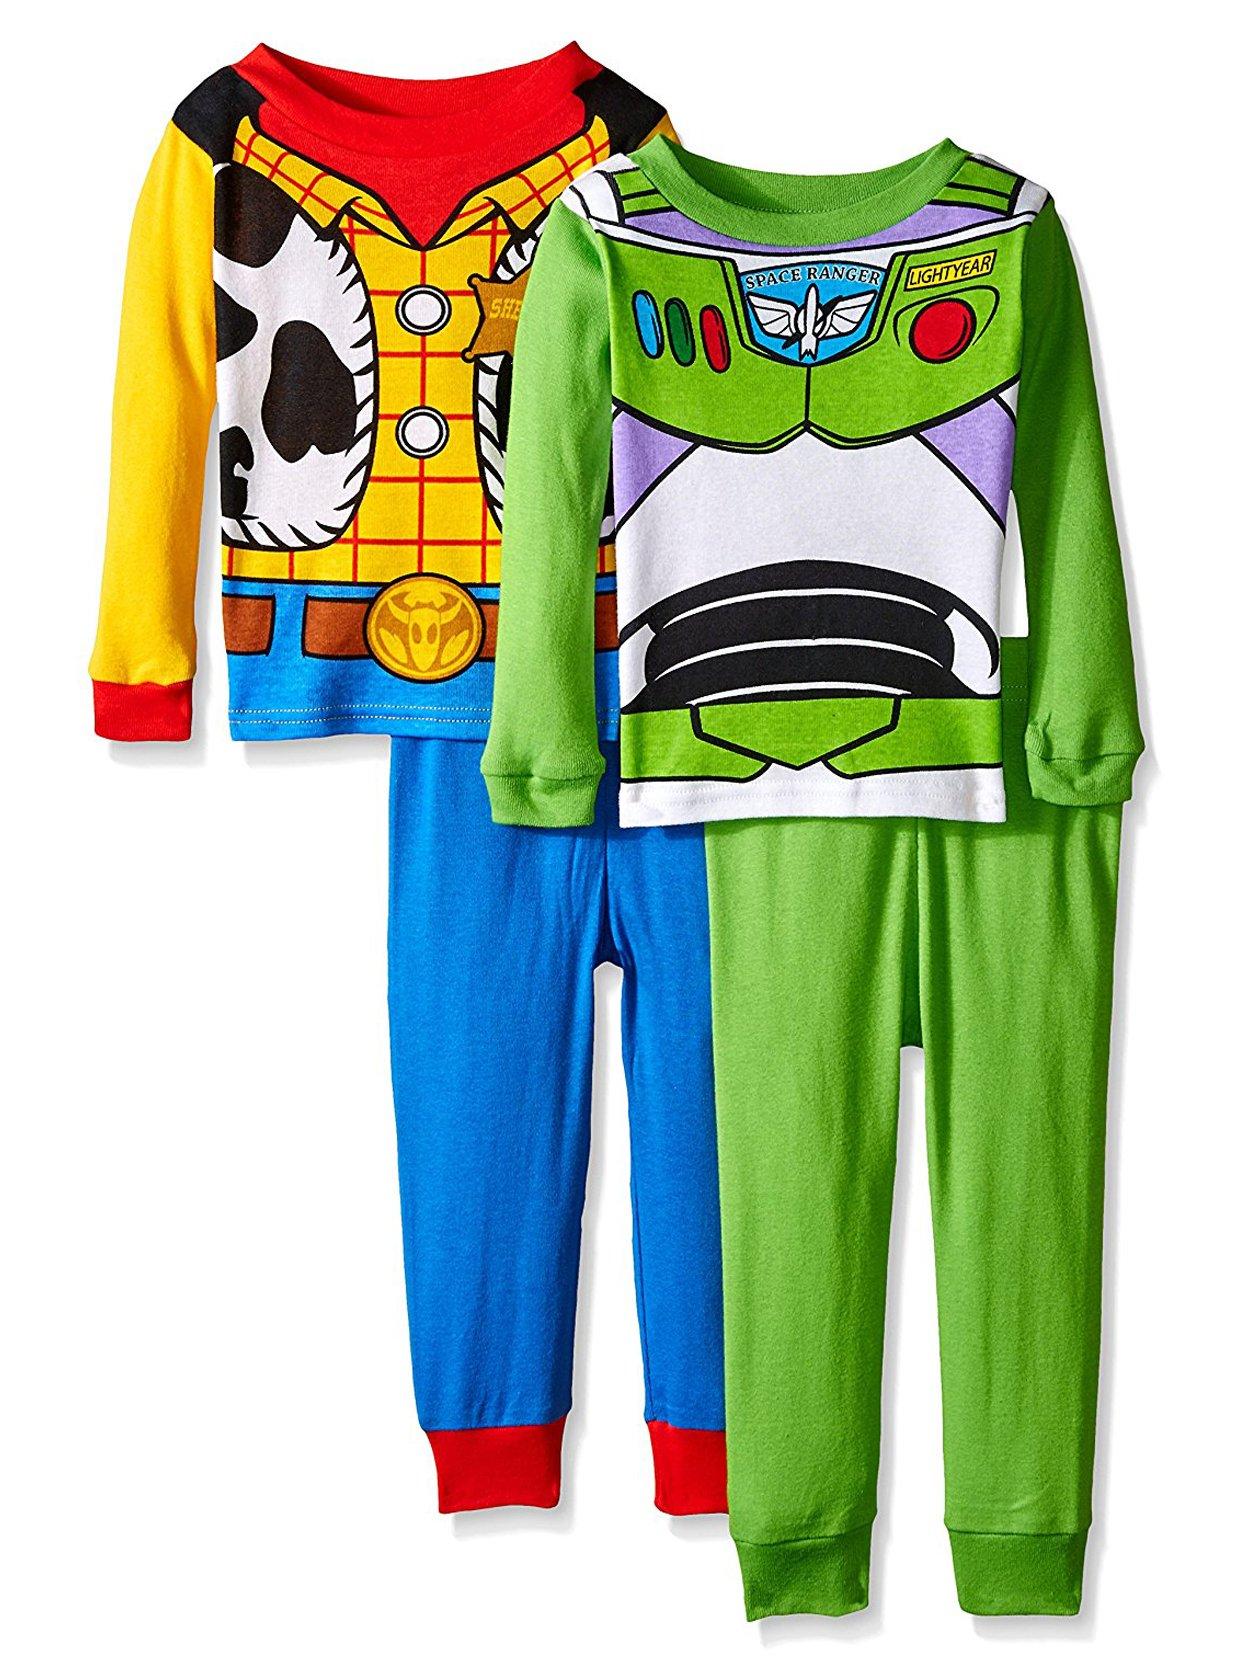 Toy Story Woody Buzz 4 piece Pajamas Set (Toddler)